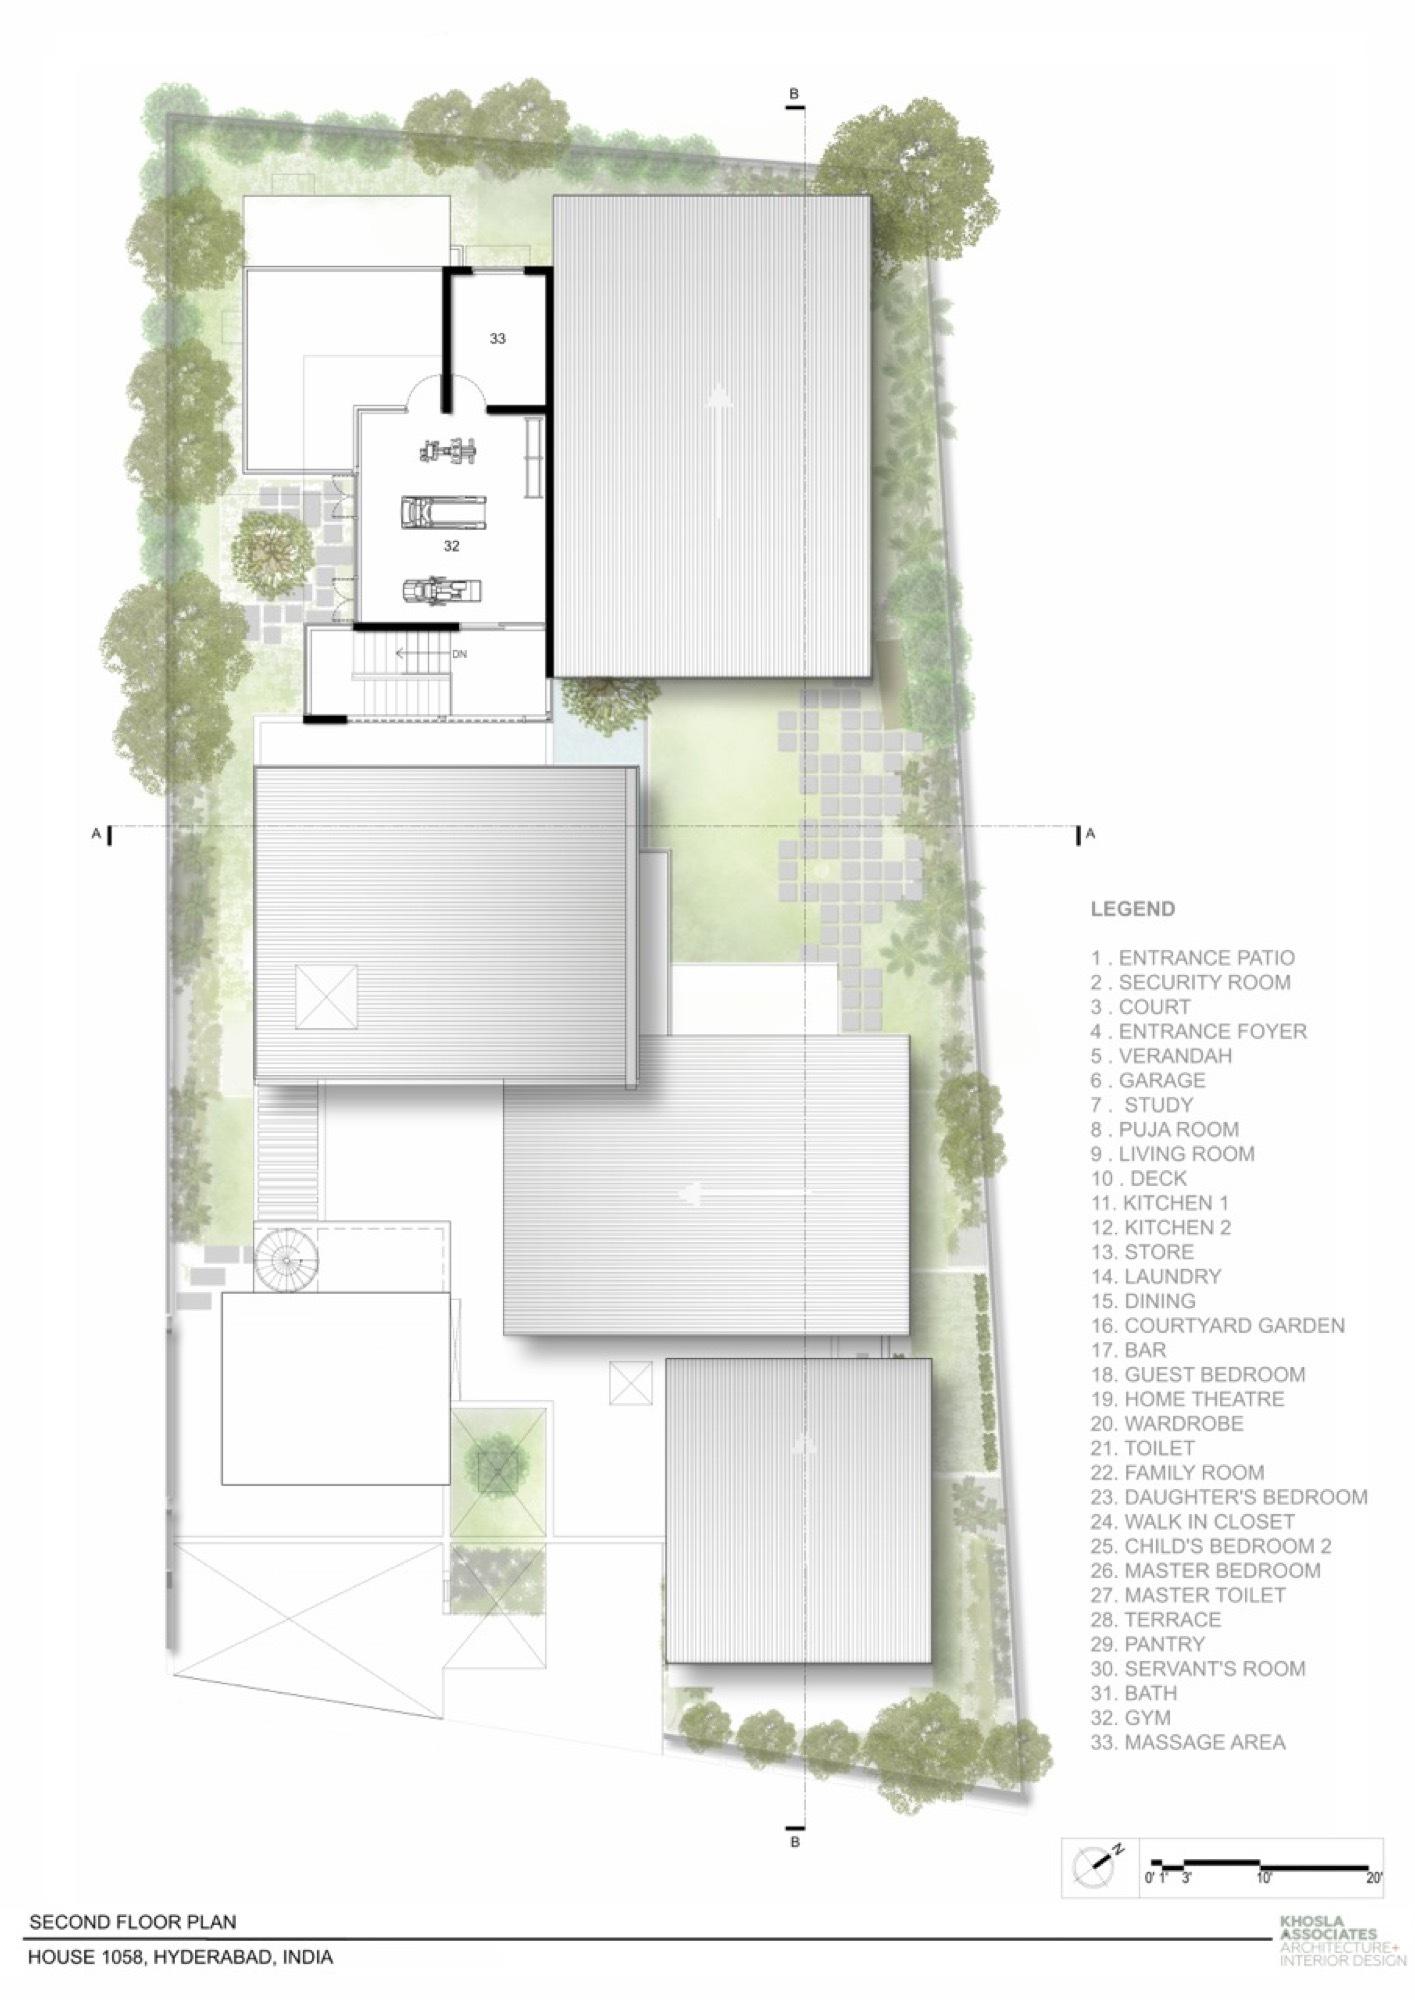 Gallery Of House 1058 Khosla Associates